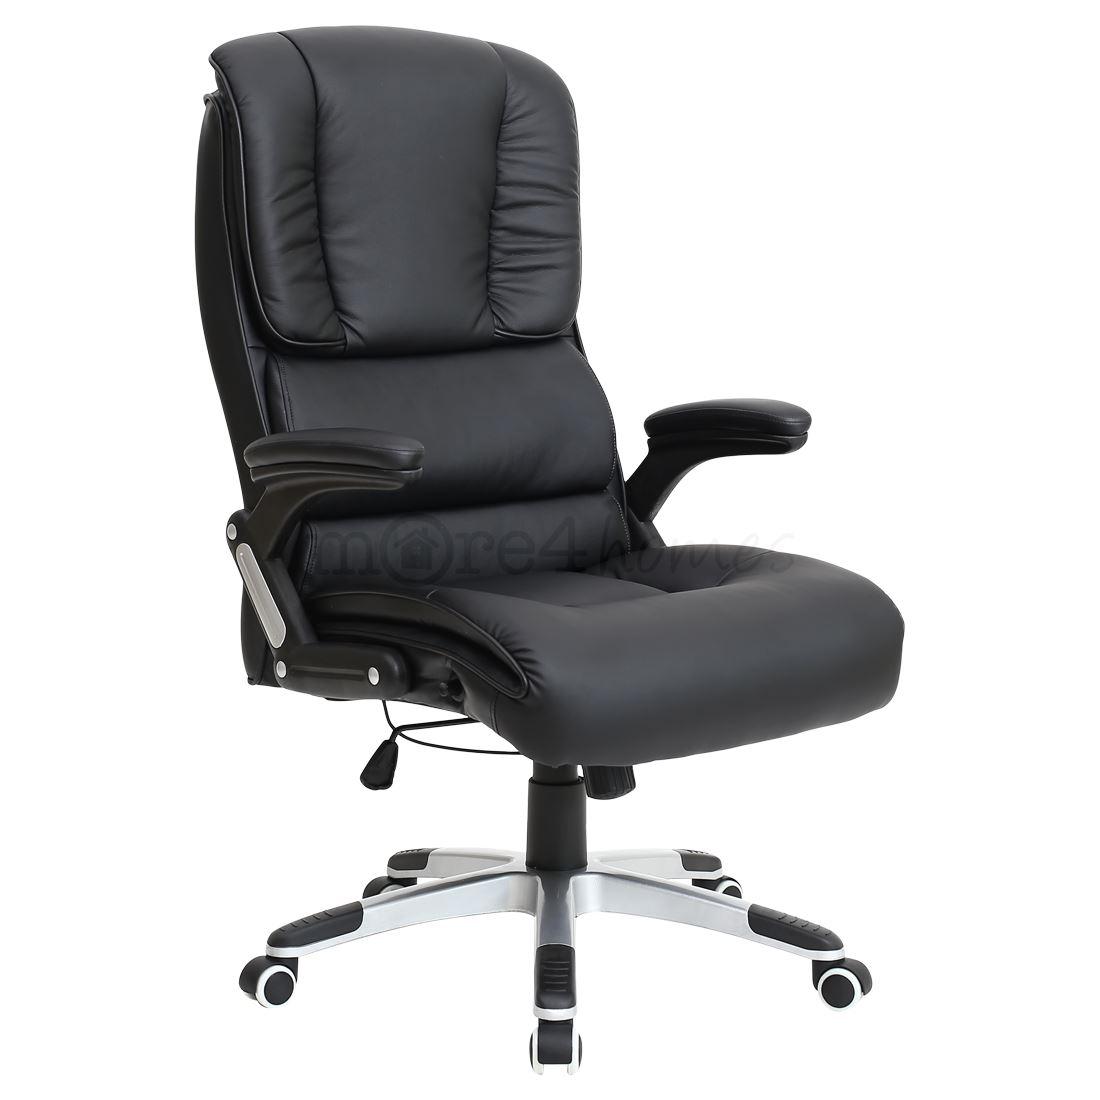 Santiago super comfortable faux leather office swivel